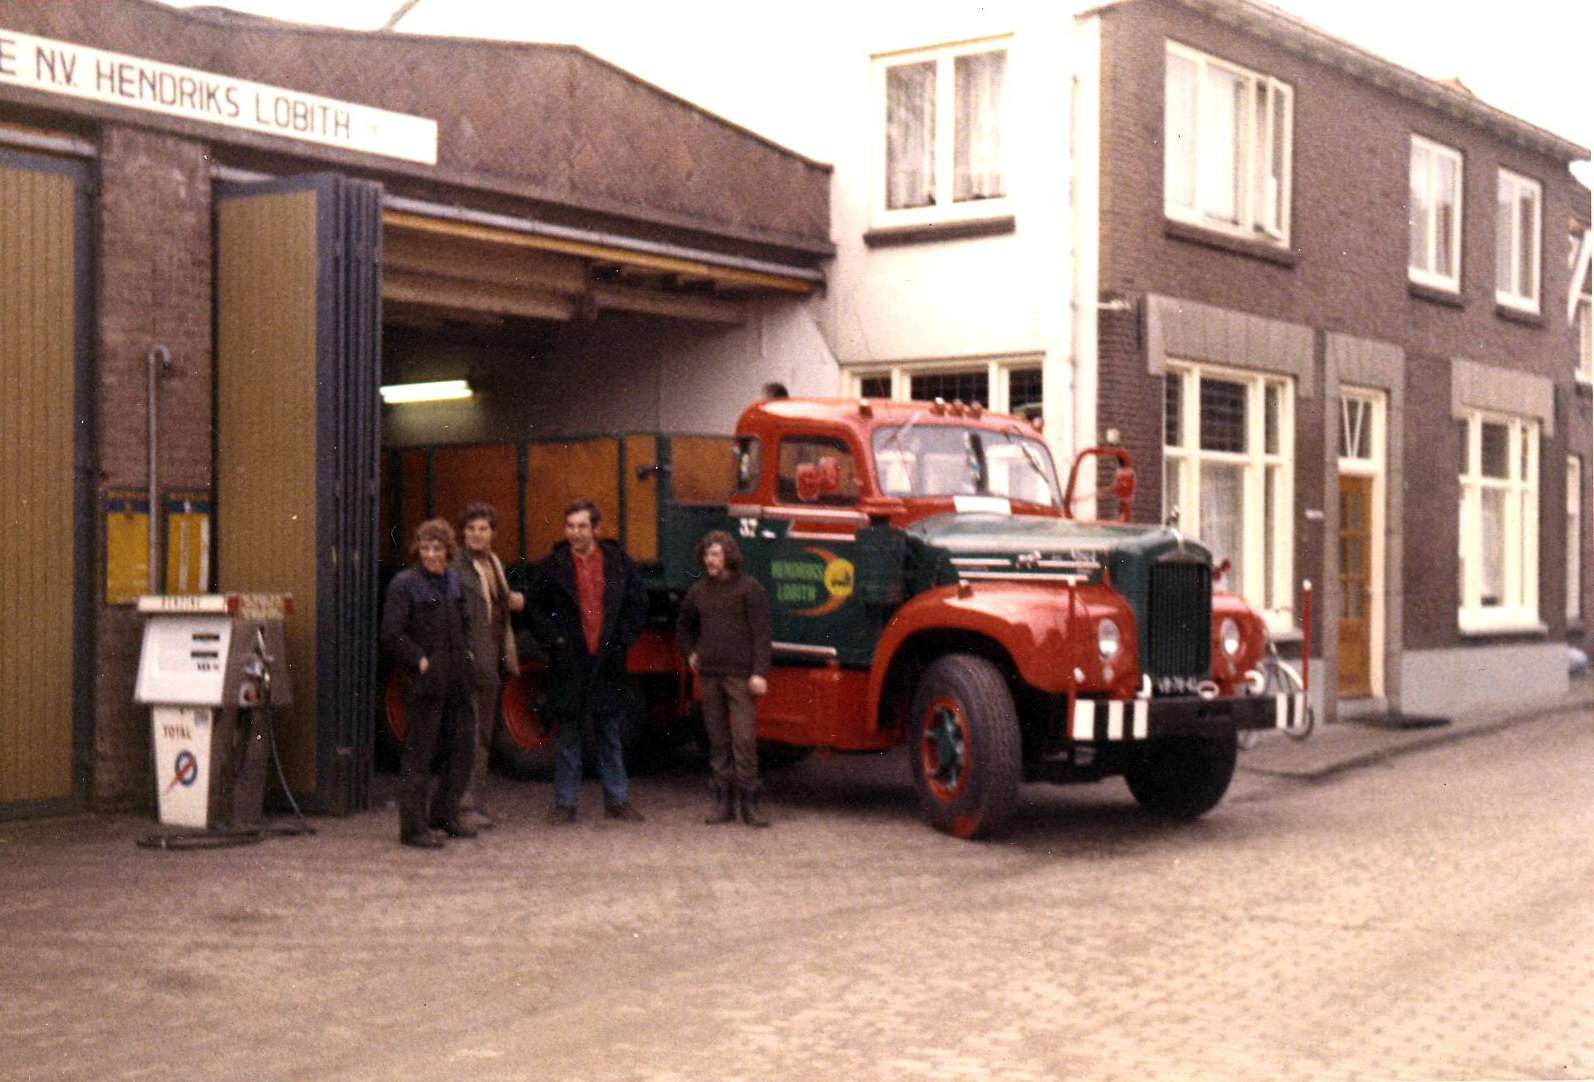 Hendriks-Lobith-Mack-B61S-VB7842